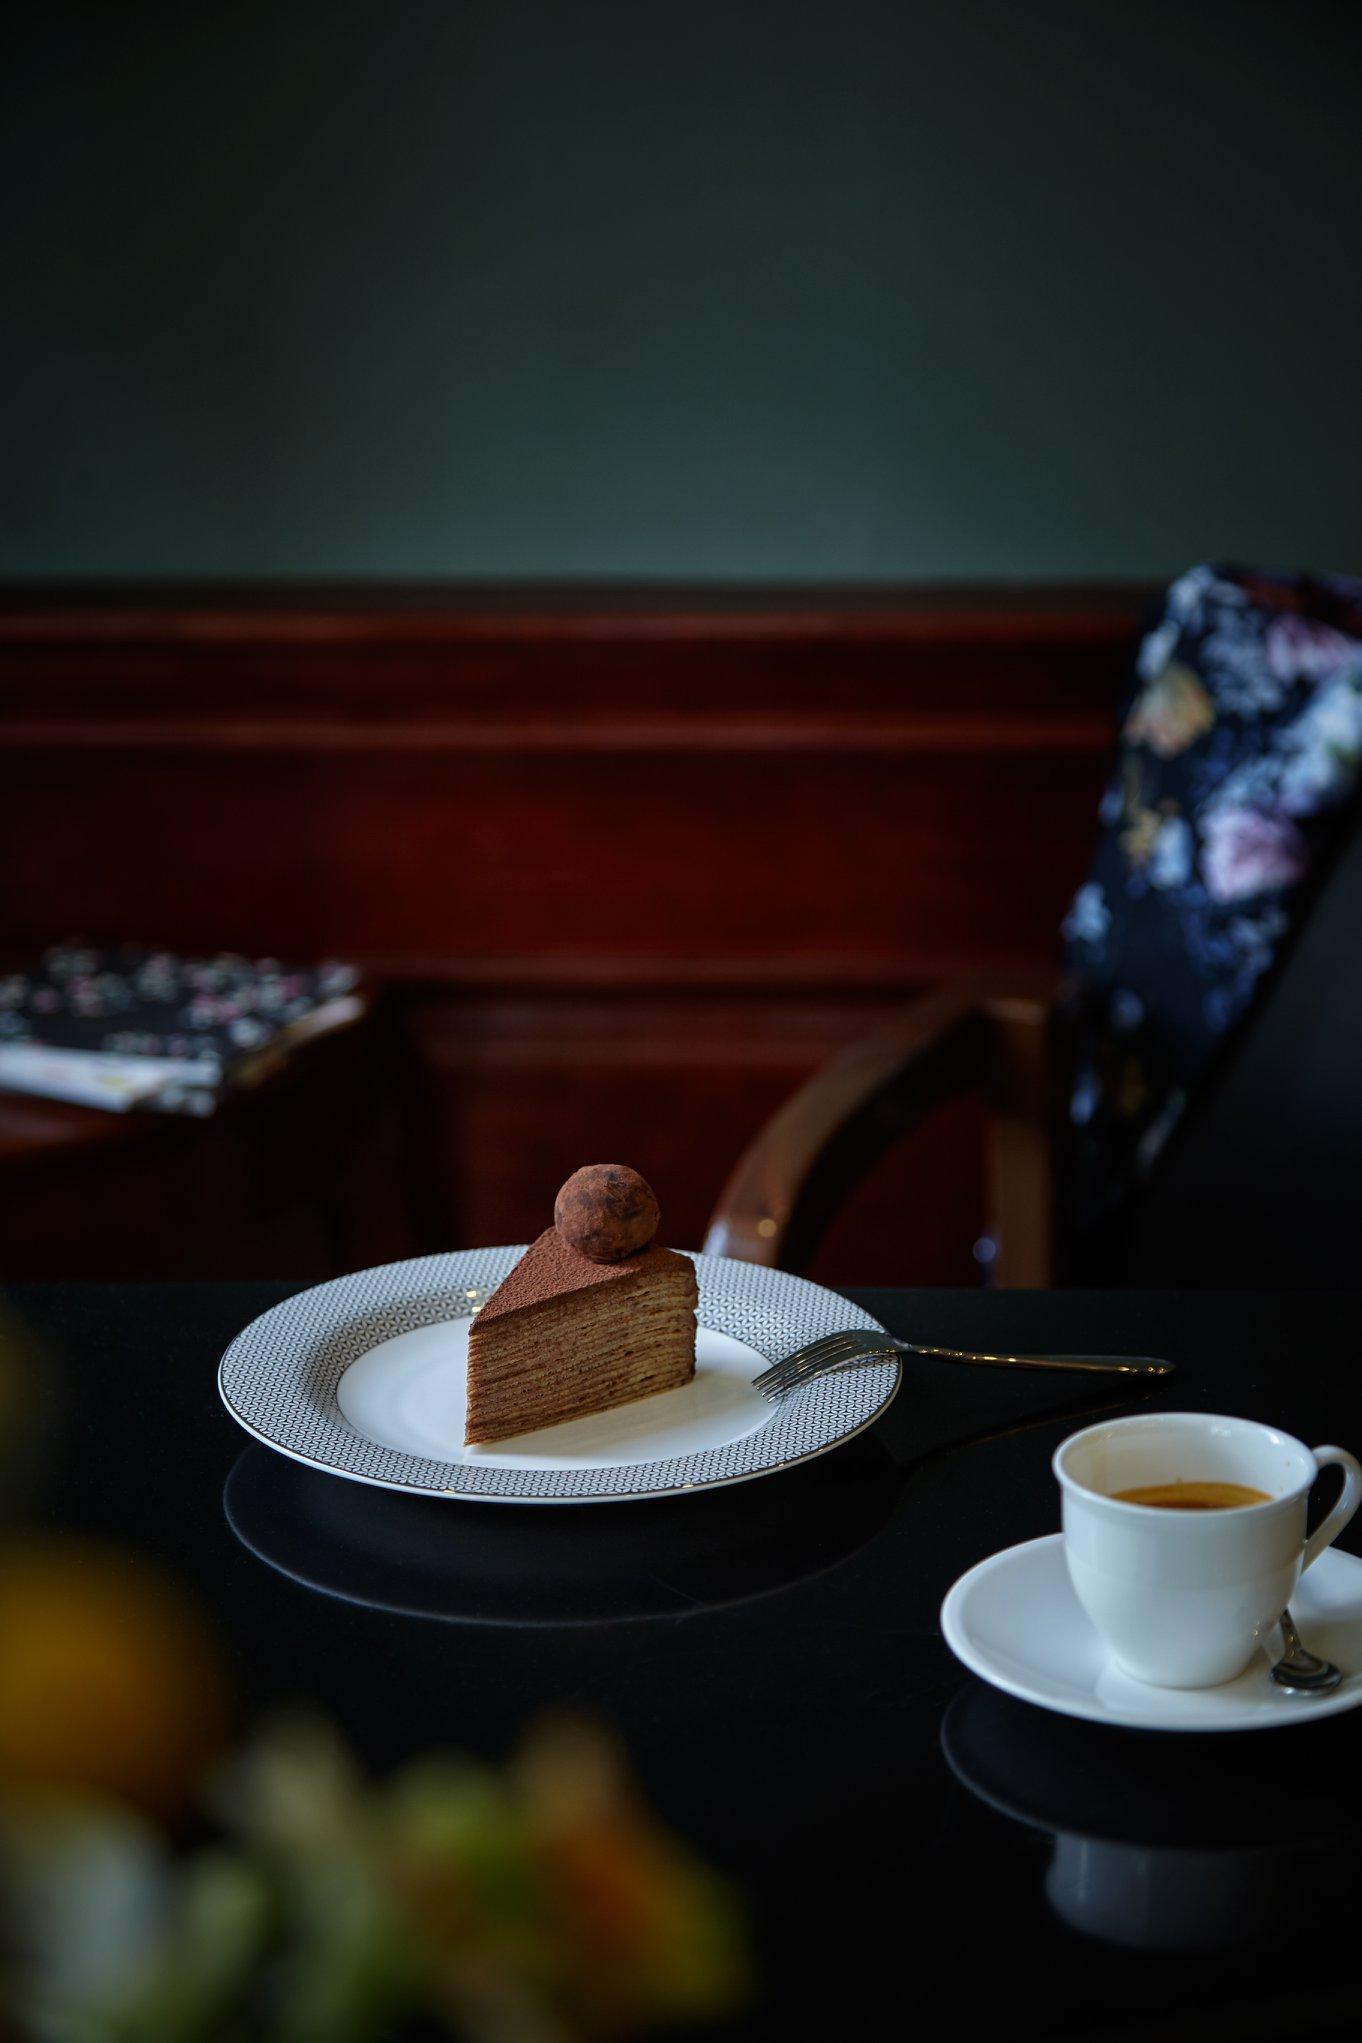 tiệm bánh ngọt Palais des Douceurs